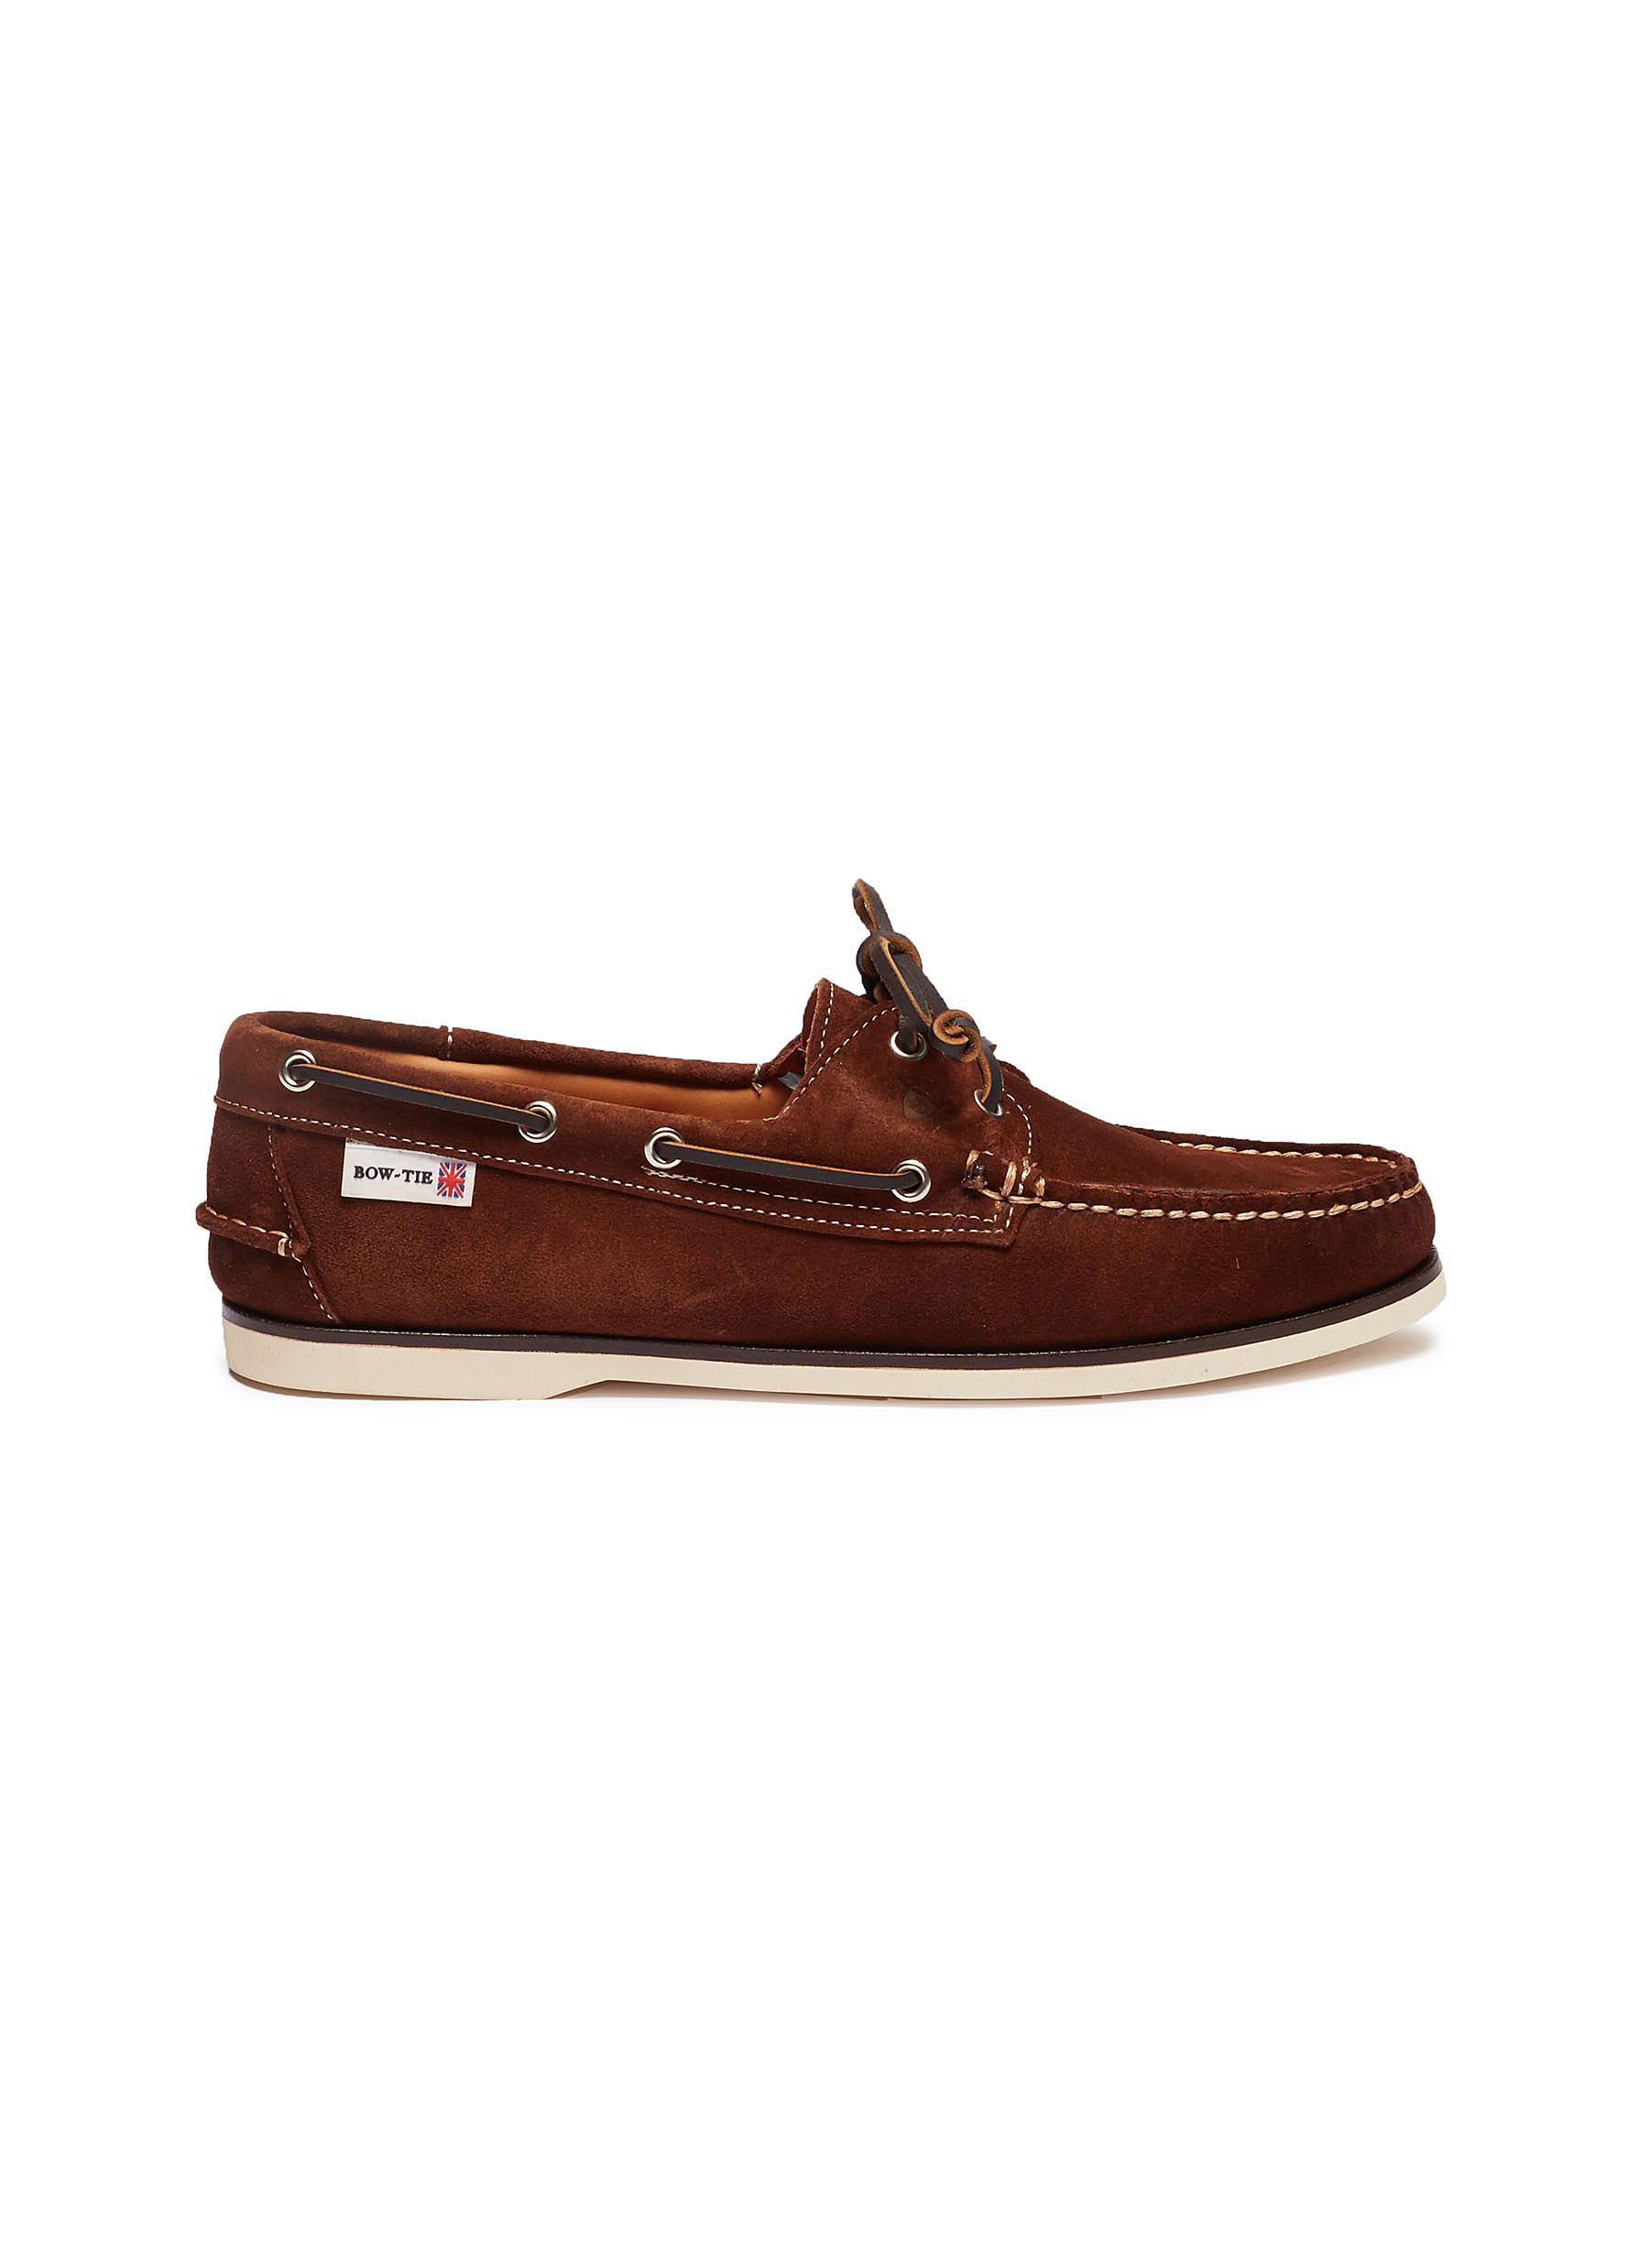 Adams suede boat shoes by Bow-Tie